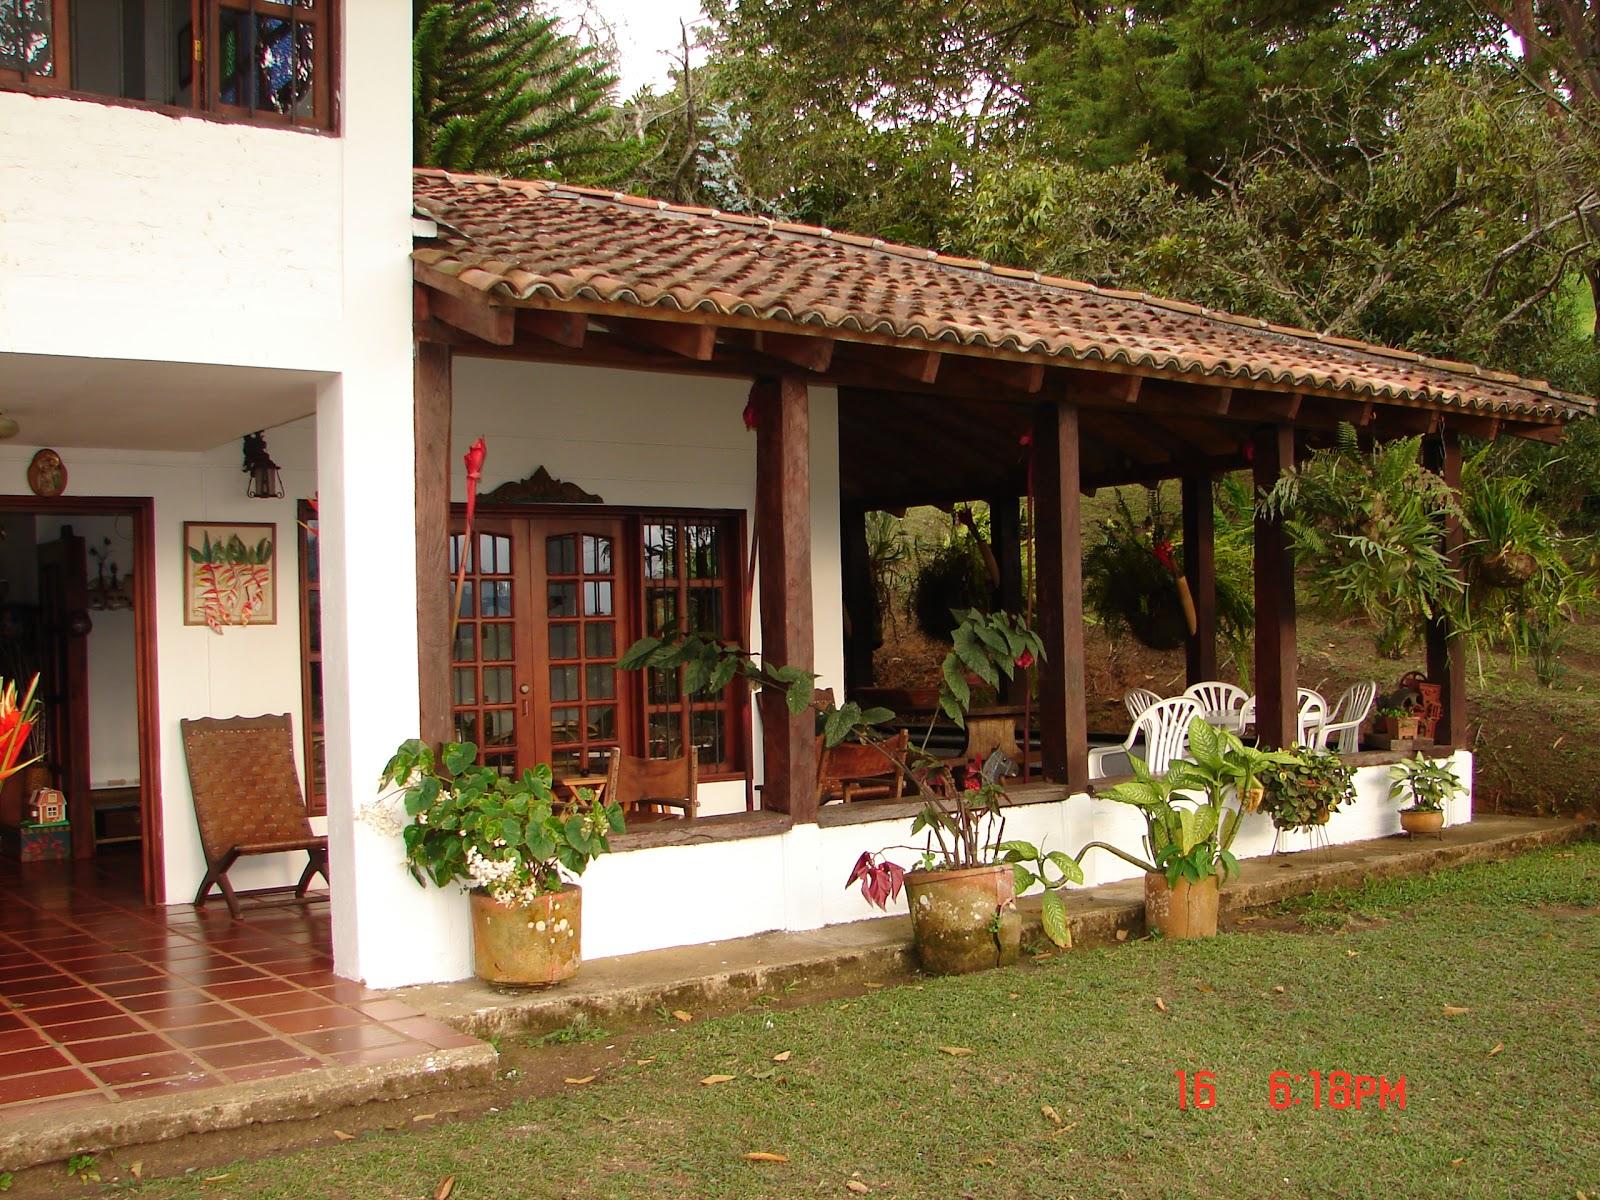 Casas campestres casas campestres 2 for Disenos de chalets rusticos